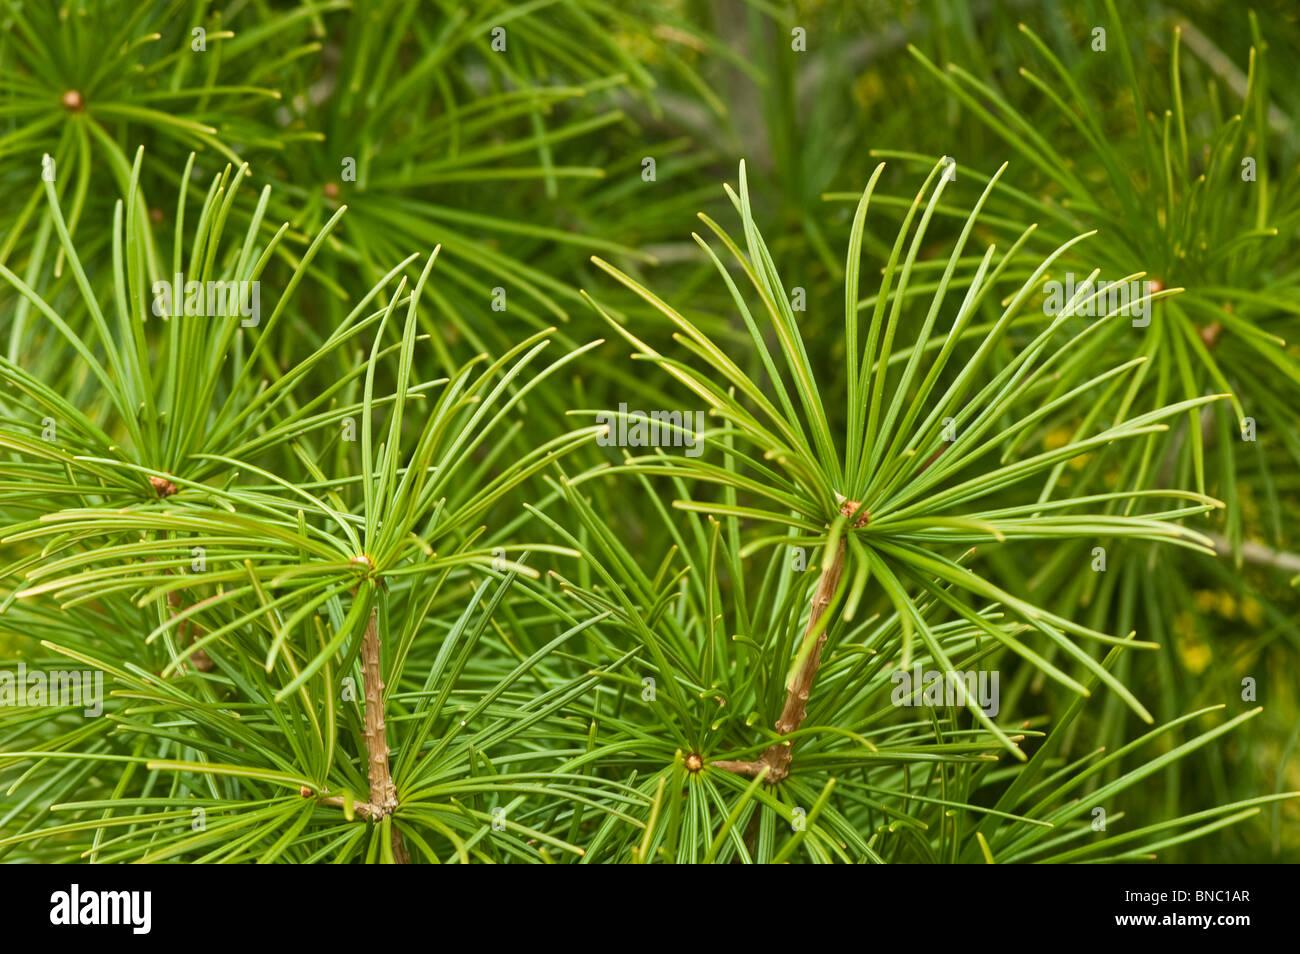 Japanese Umbrella Pine Sciadopitys Verticillata Taxodiaceae